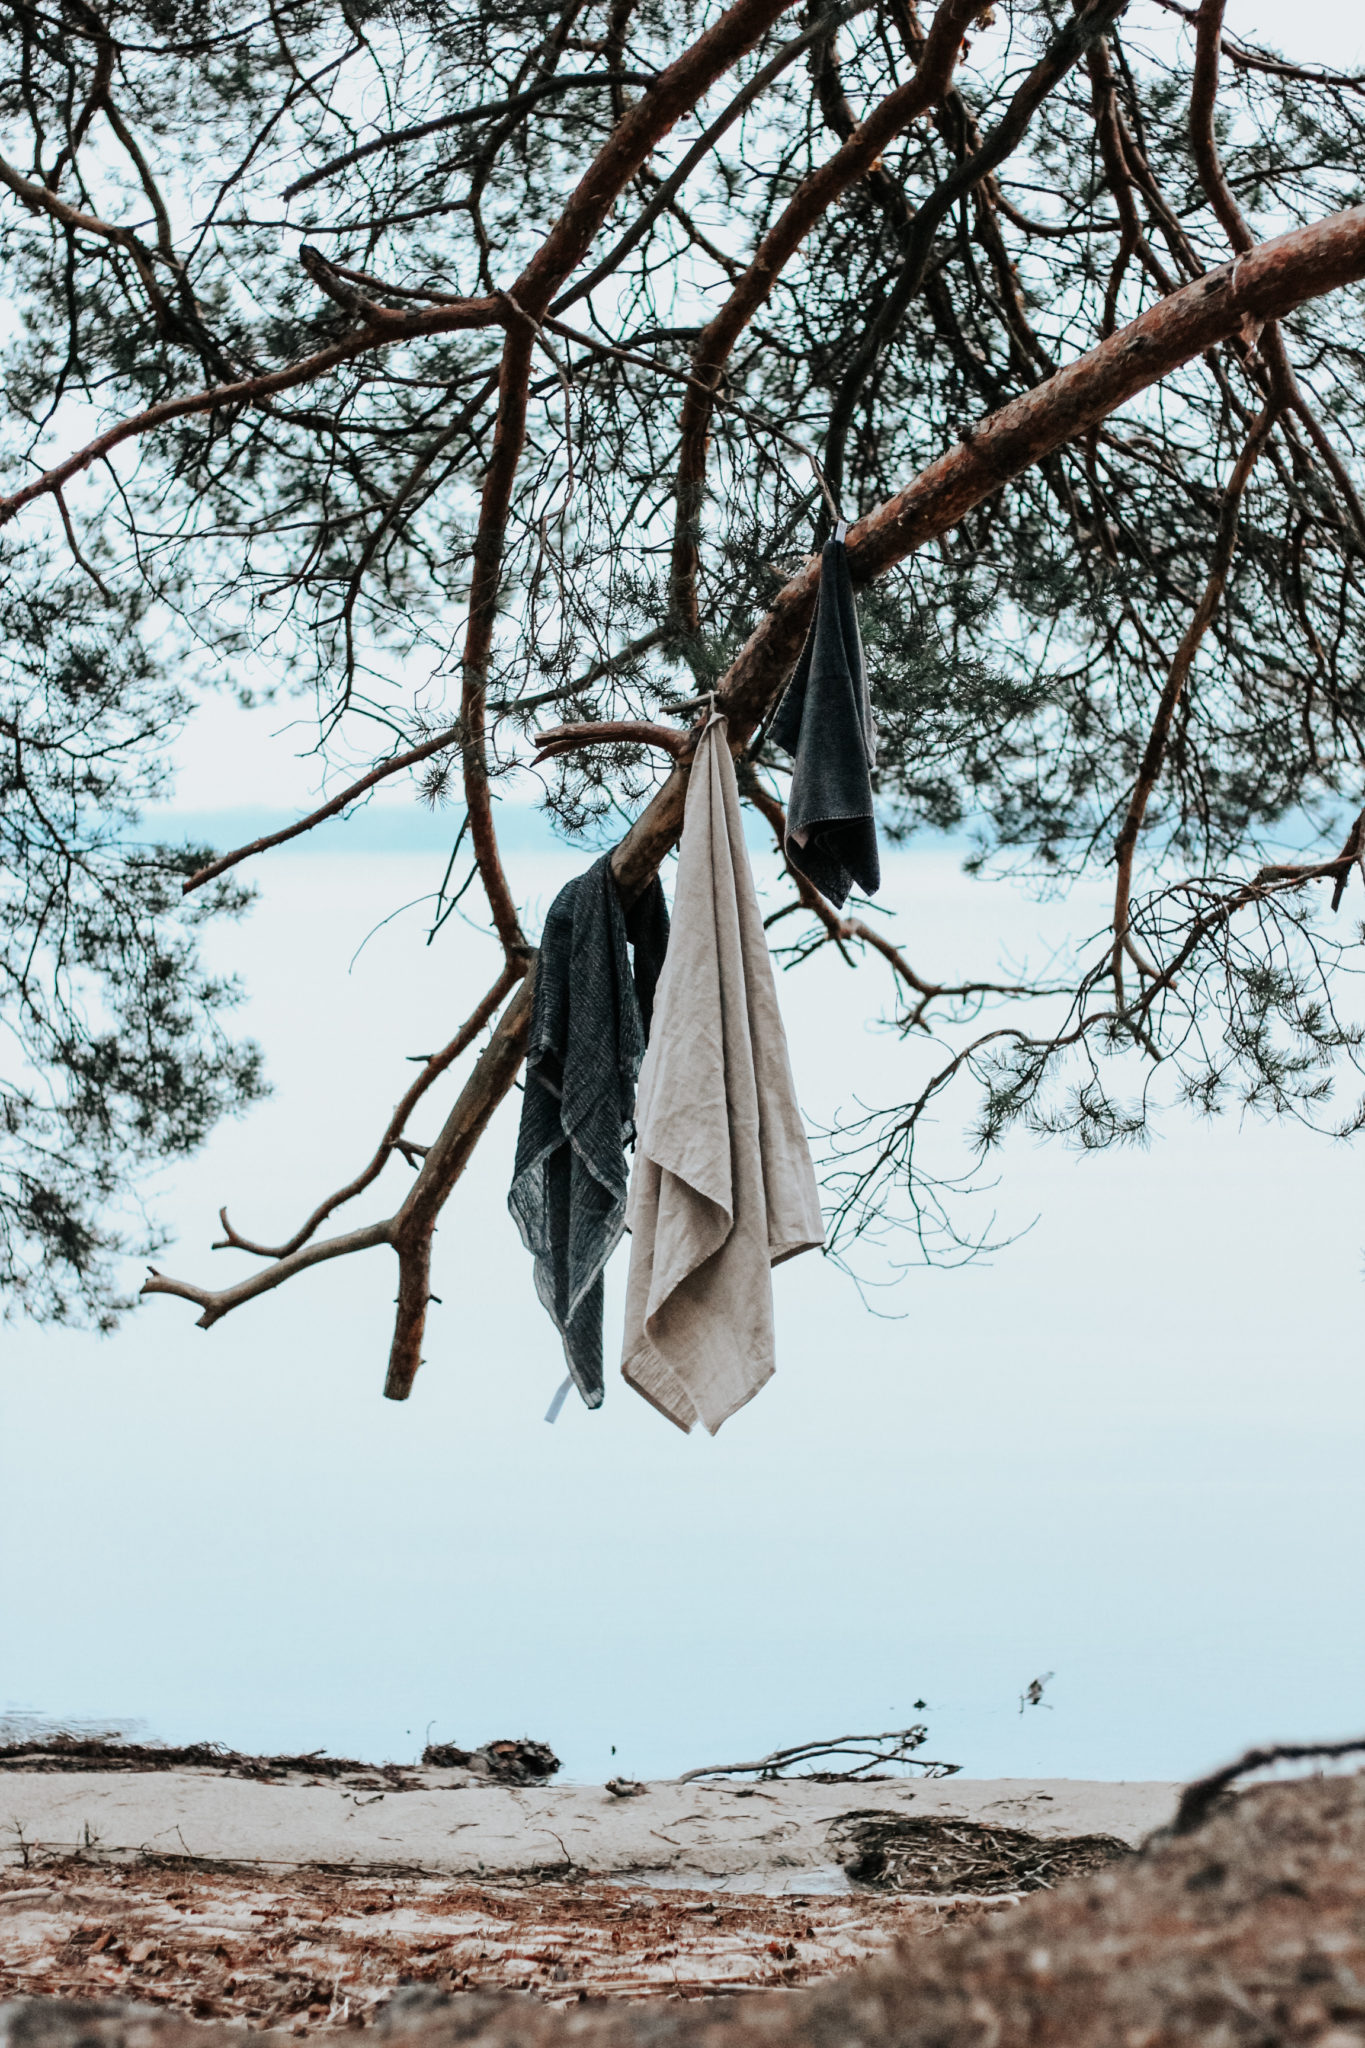 eettiset ekologiset vastuulliset pyyhkeet weecos